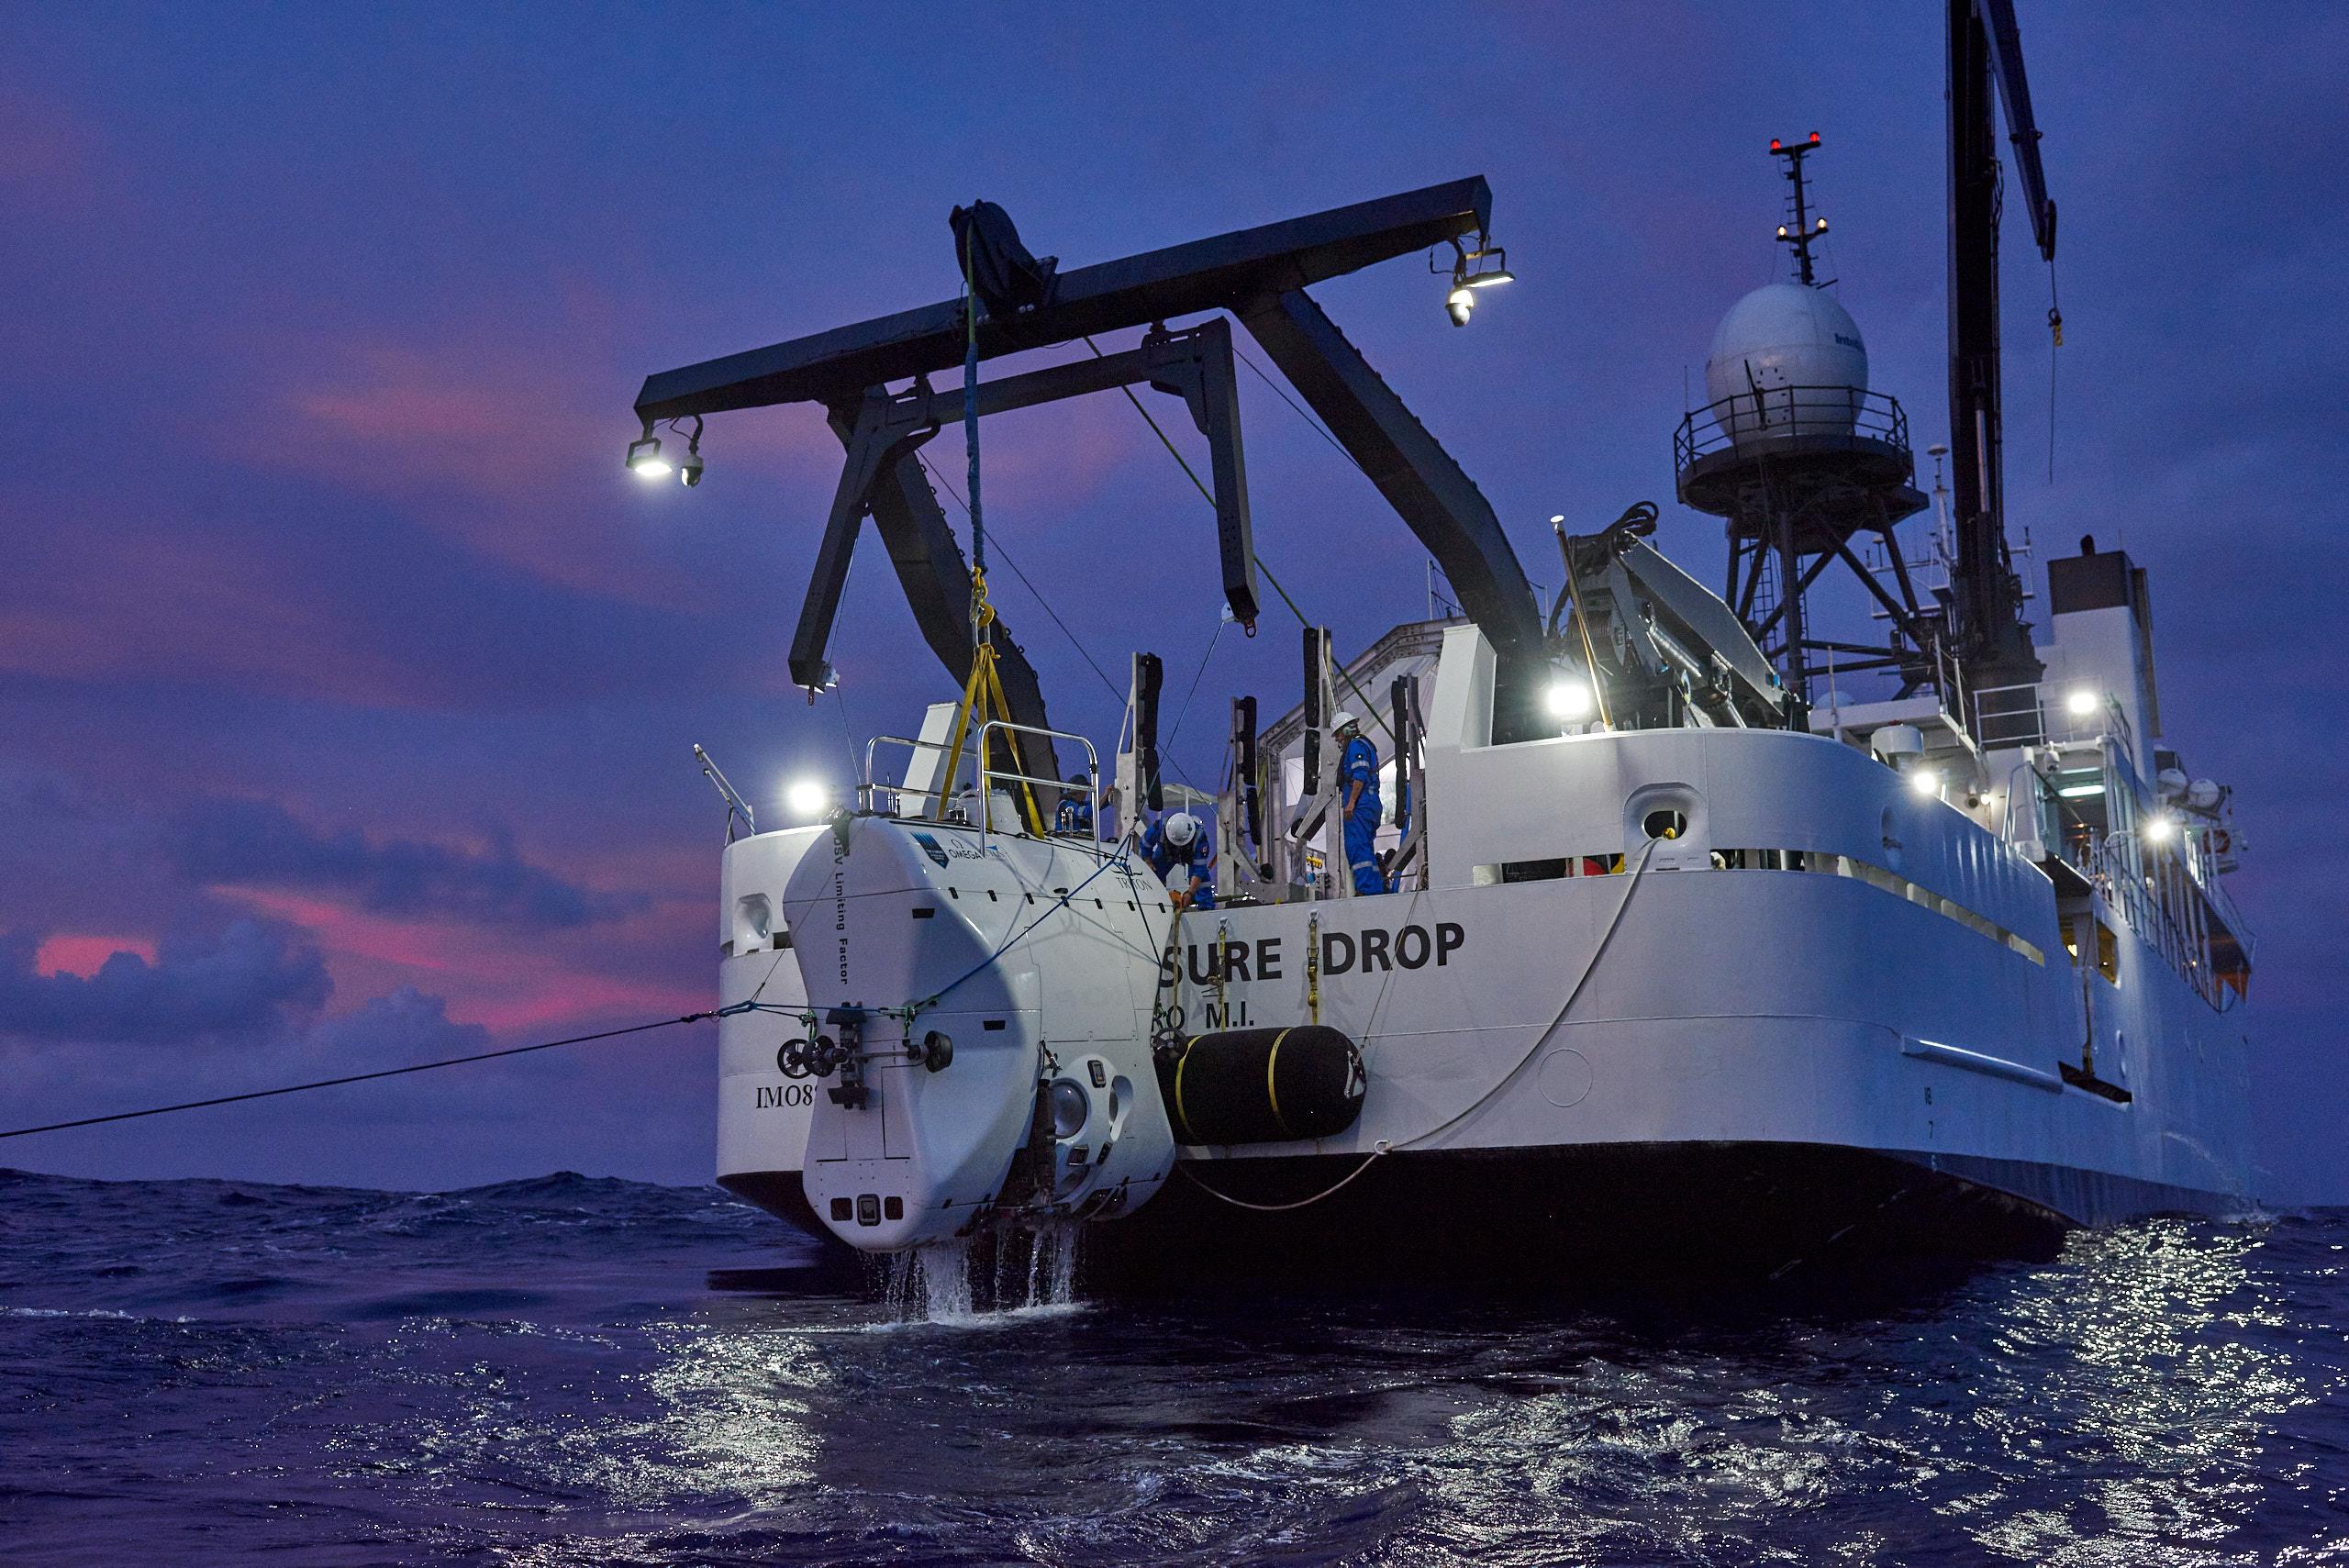 James Cameron disputes Victor Vescovo's record for deepest ocean dive